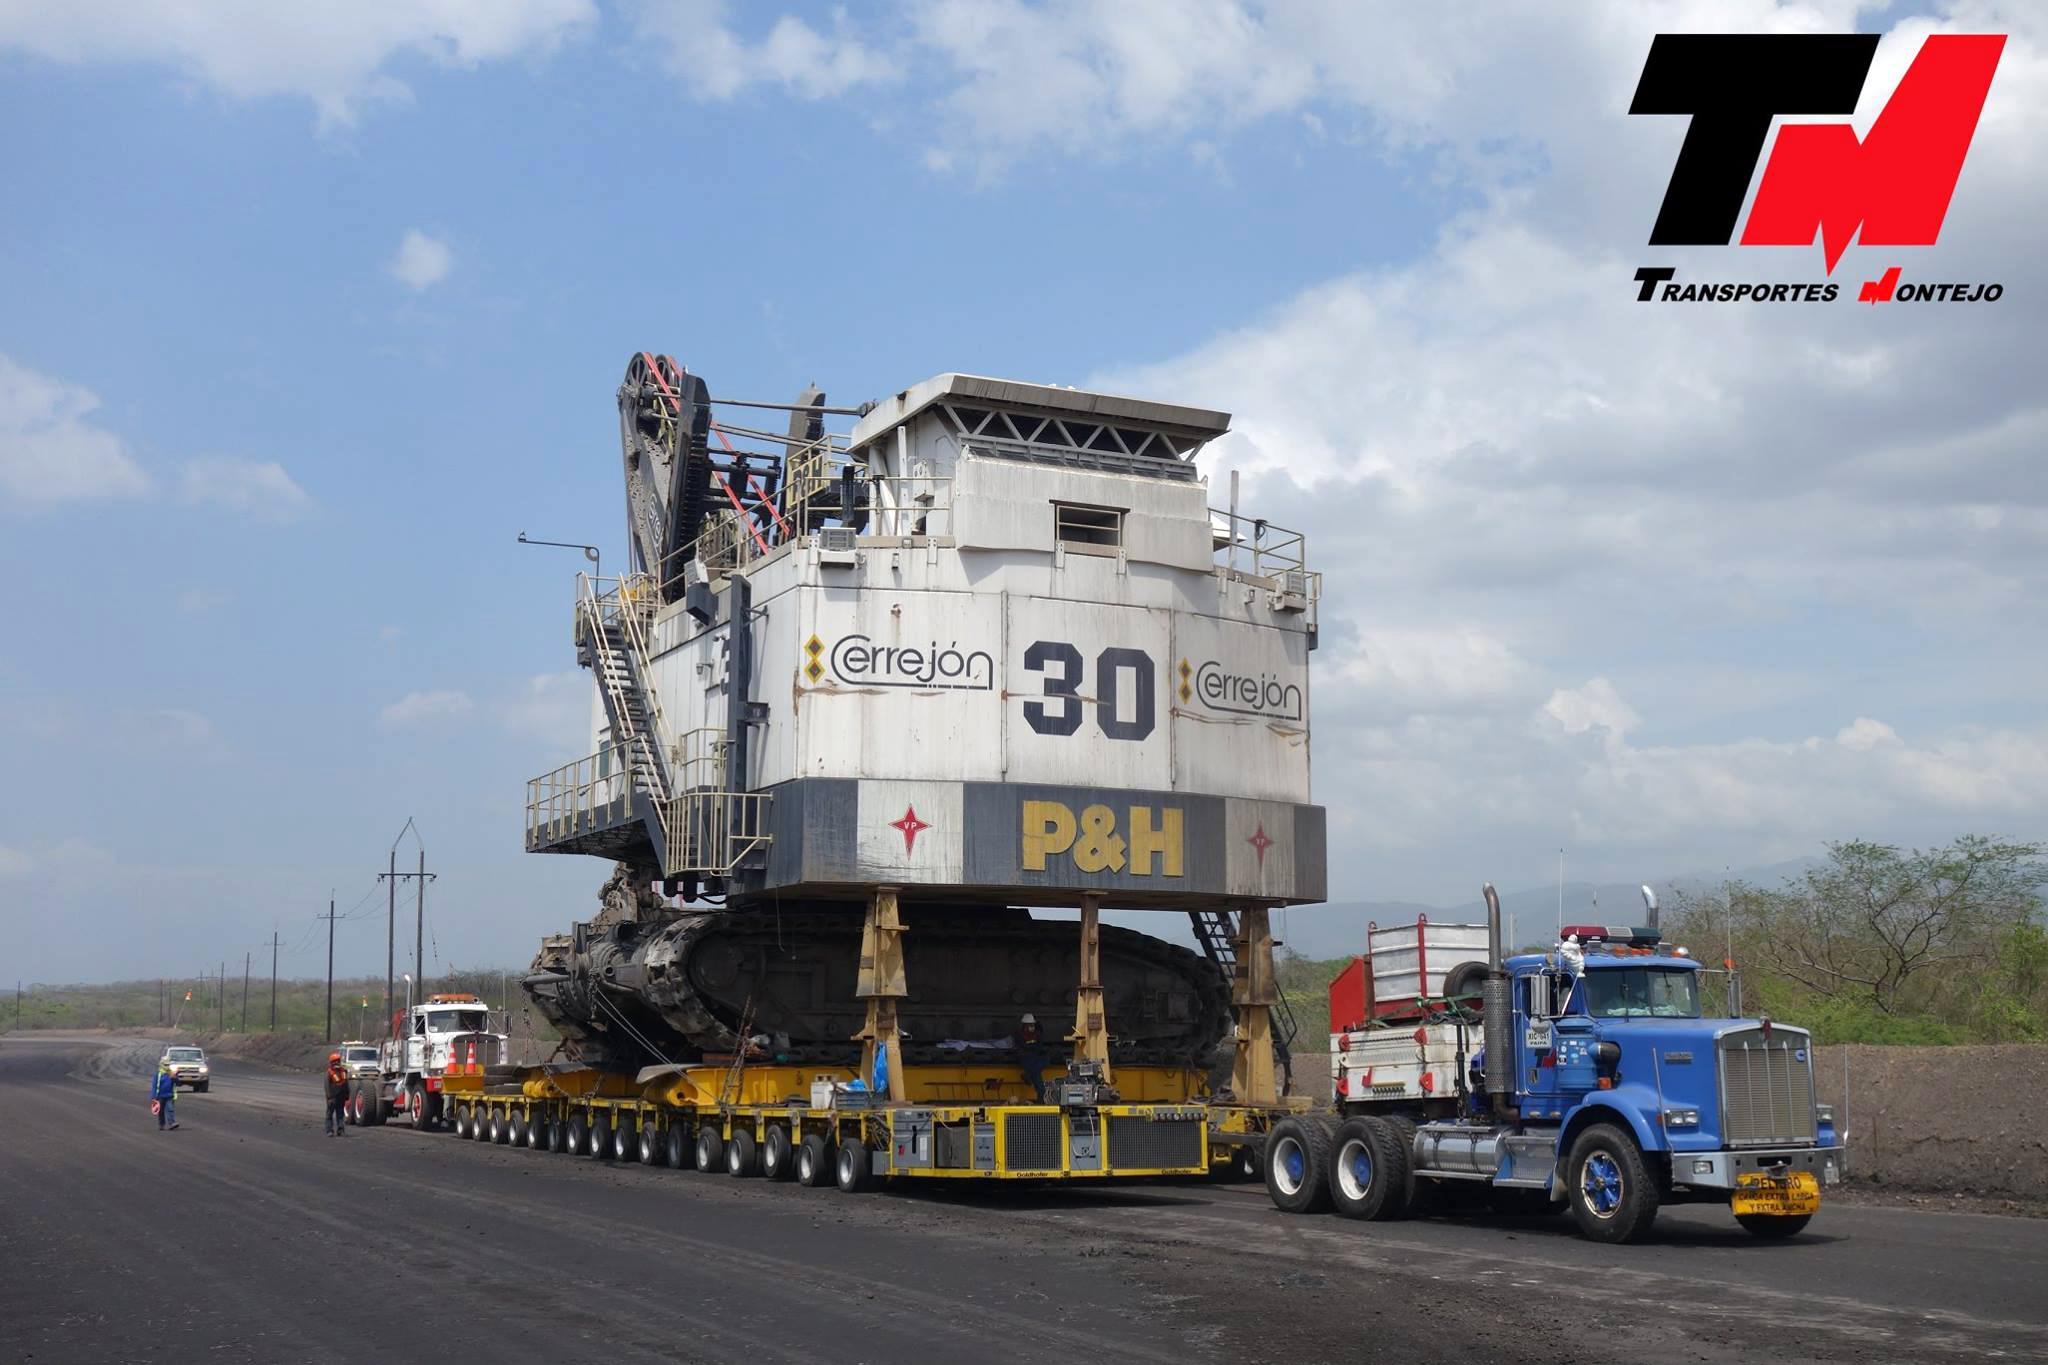 Transfert C30 16